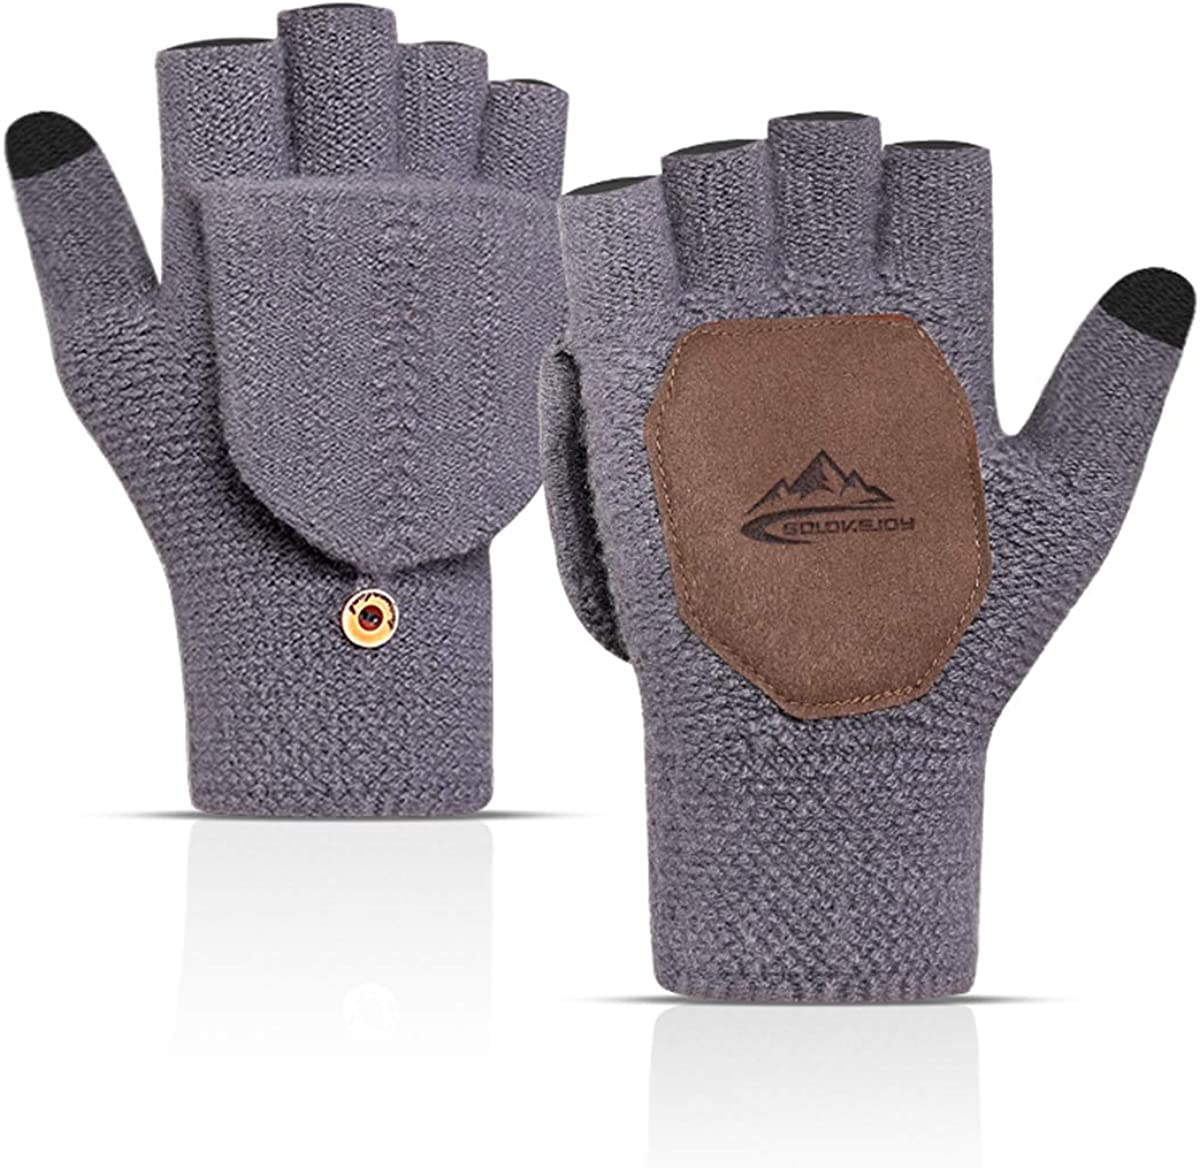 Convertible Gloves Wool Knit Fingerless Gloves Warm Windproof Touchscreen Anti-Slip Thermal Warm Gloves Mittensfor Men Women